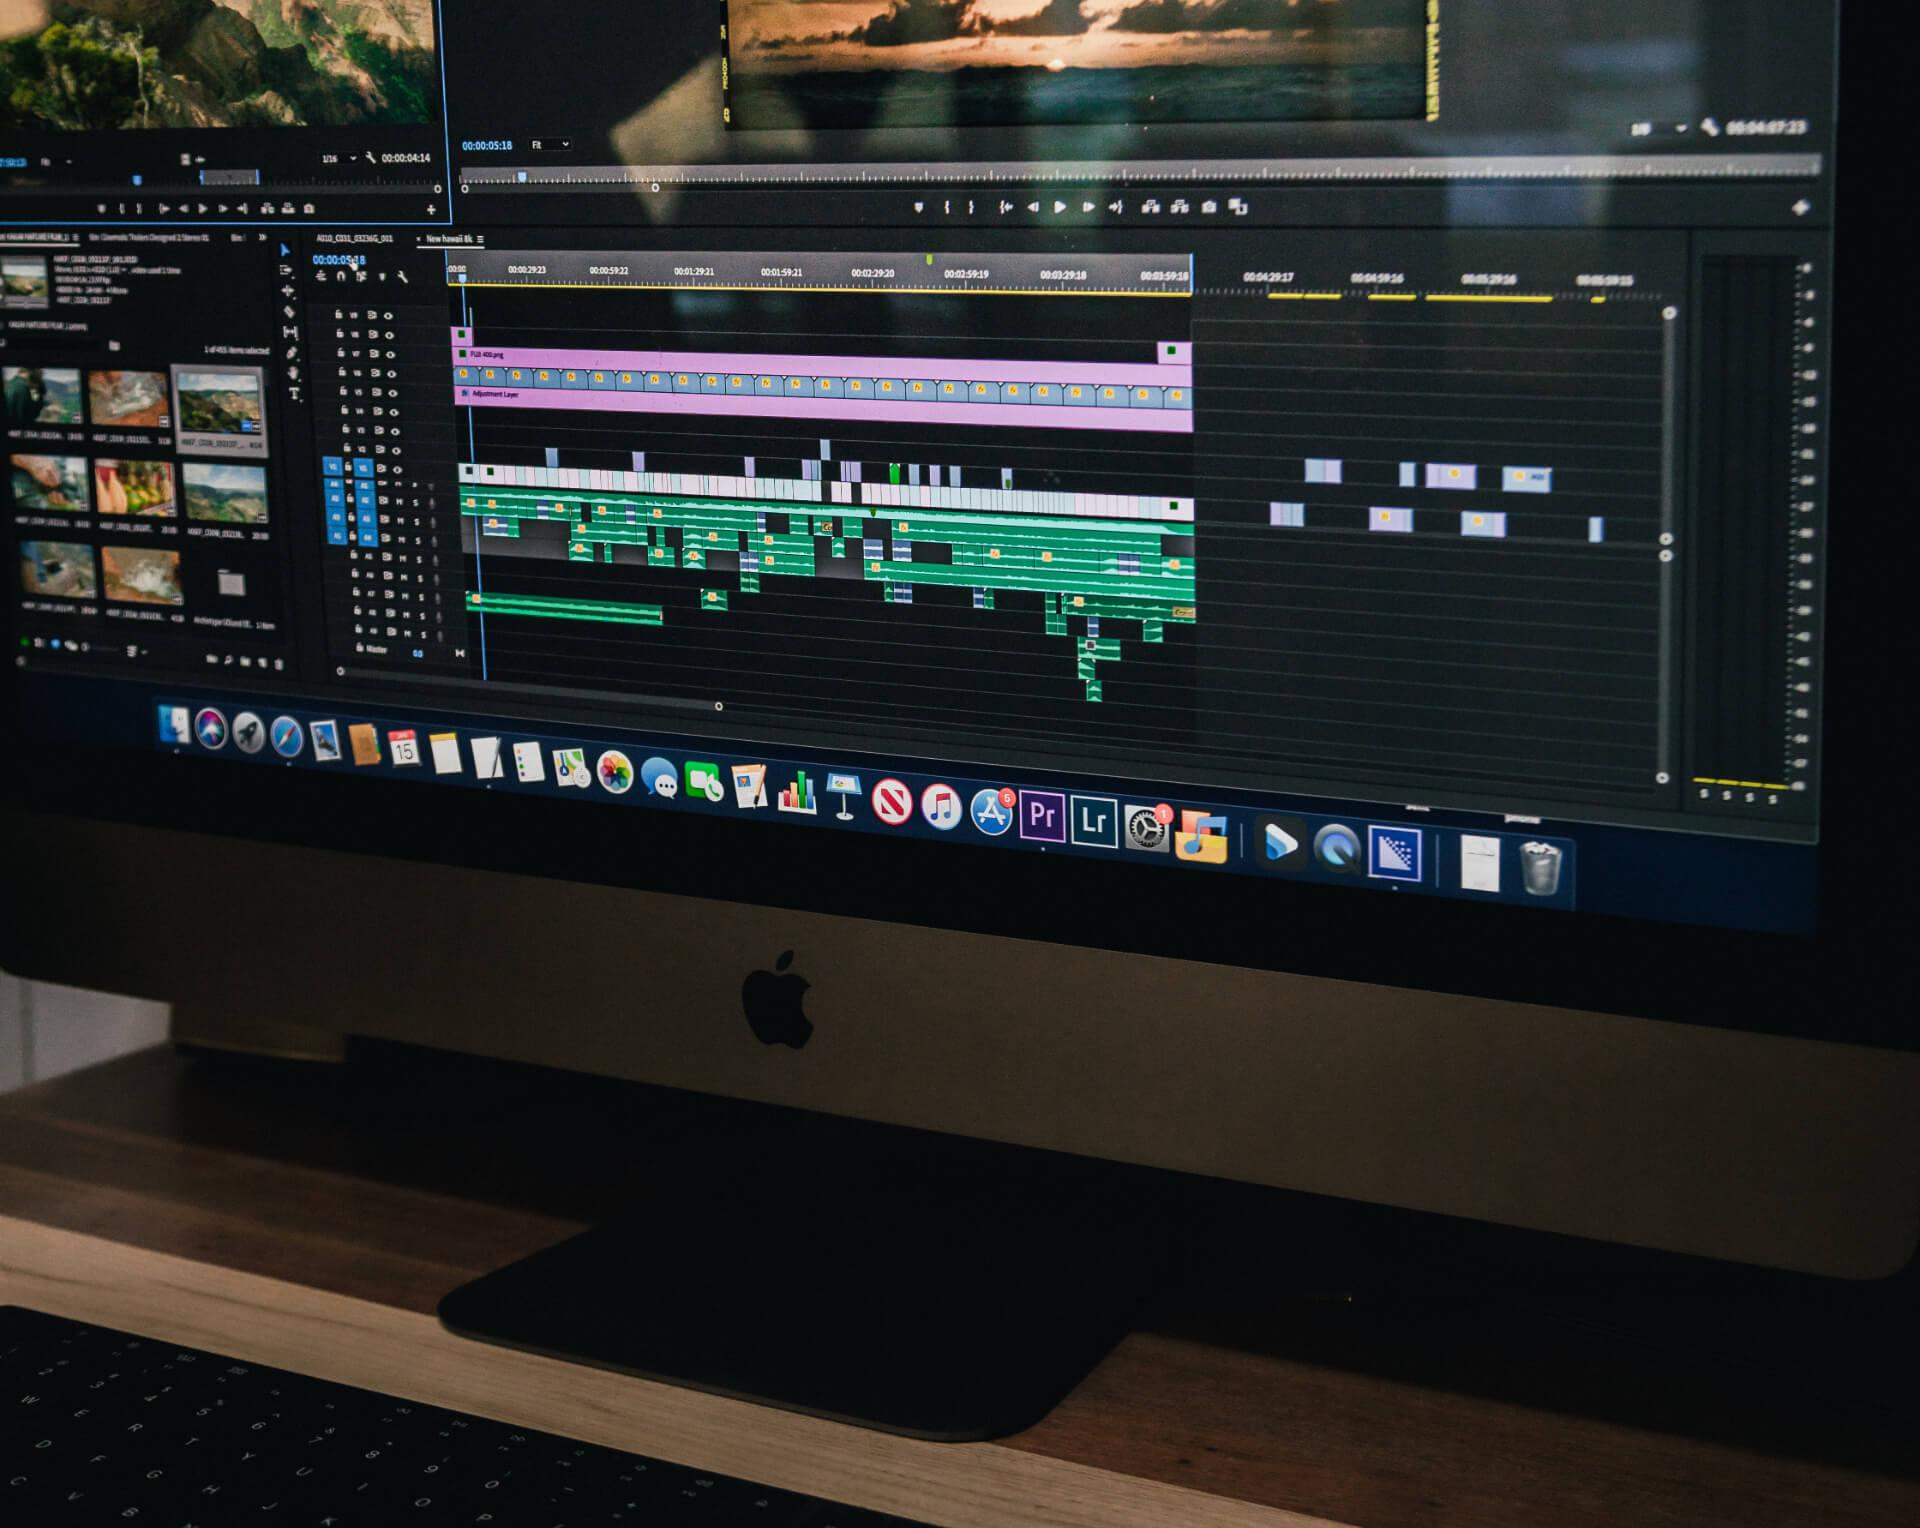 Lowtown-Studios--Production Suite Rental--Editing Suite2